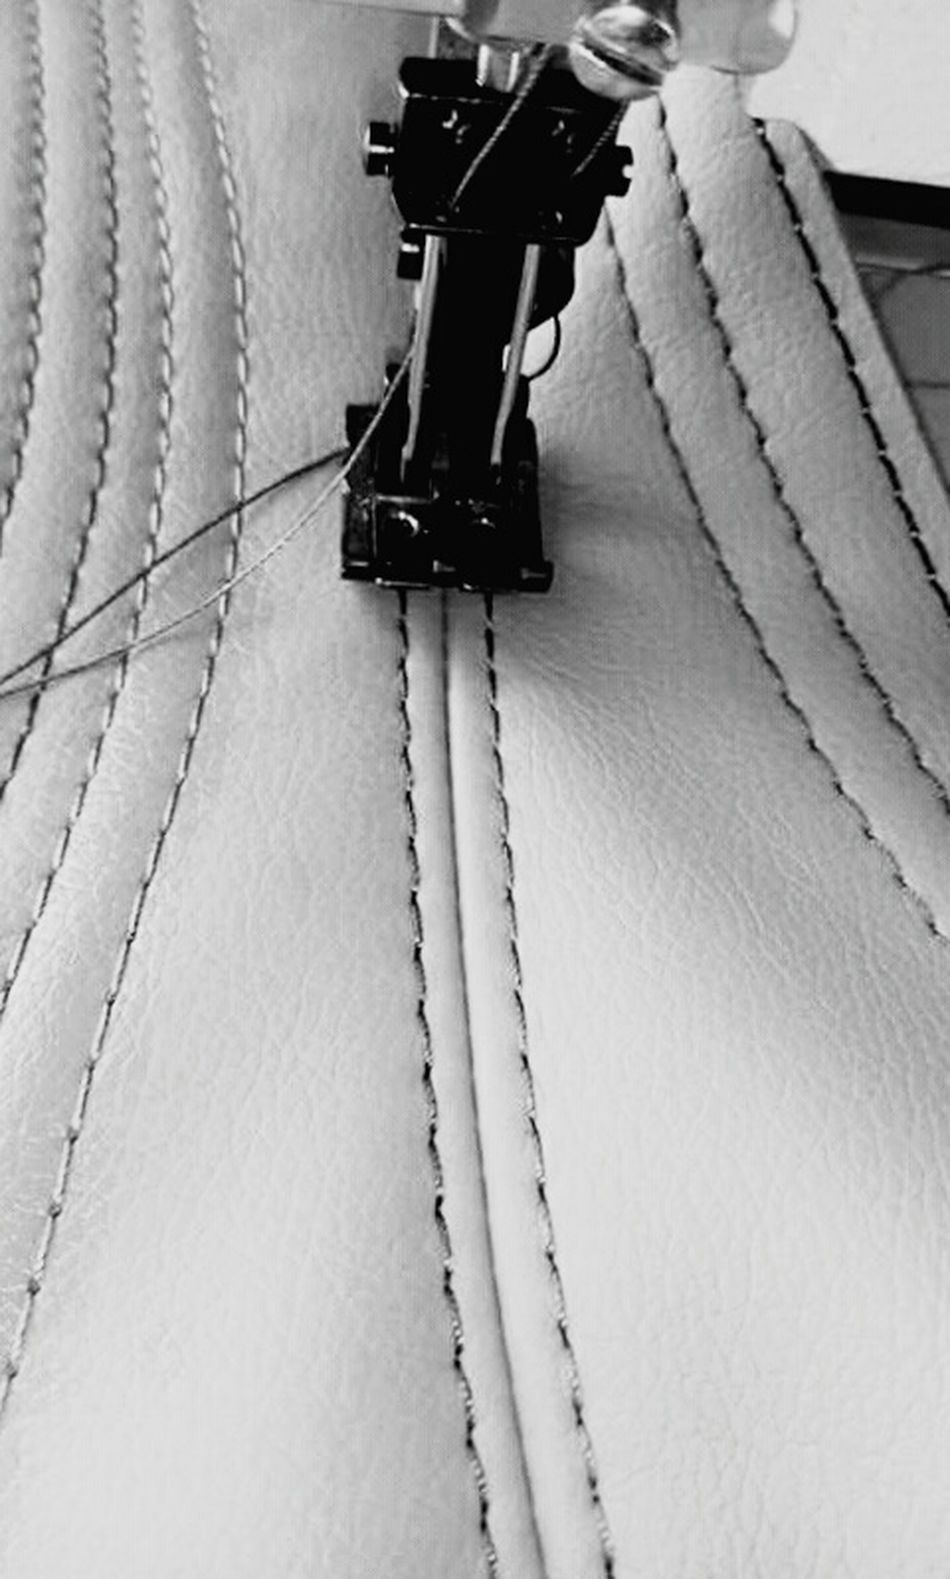 Maquina De Costura Coser Blackandwhite Black And White Black & White Blackandwhite Photography Black And White Photography Black&white Black And White Collection  Black And White Portrait Blanco Y Negro Blancoynegro Blanco & Negro  Blanckandwhite